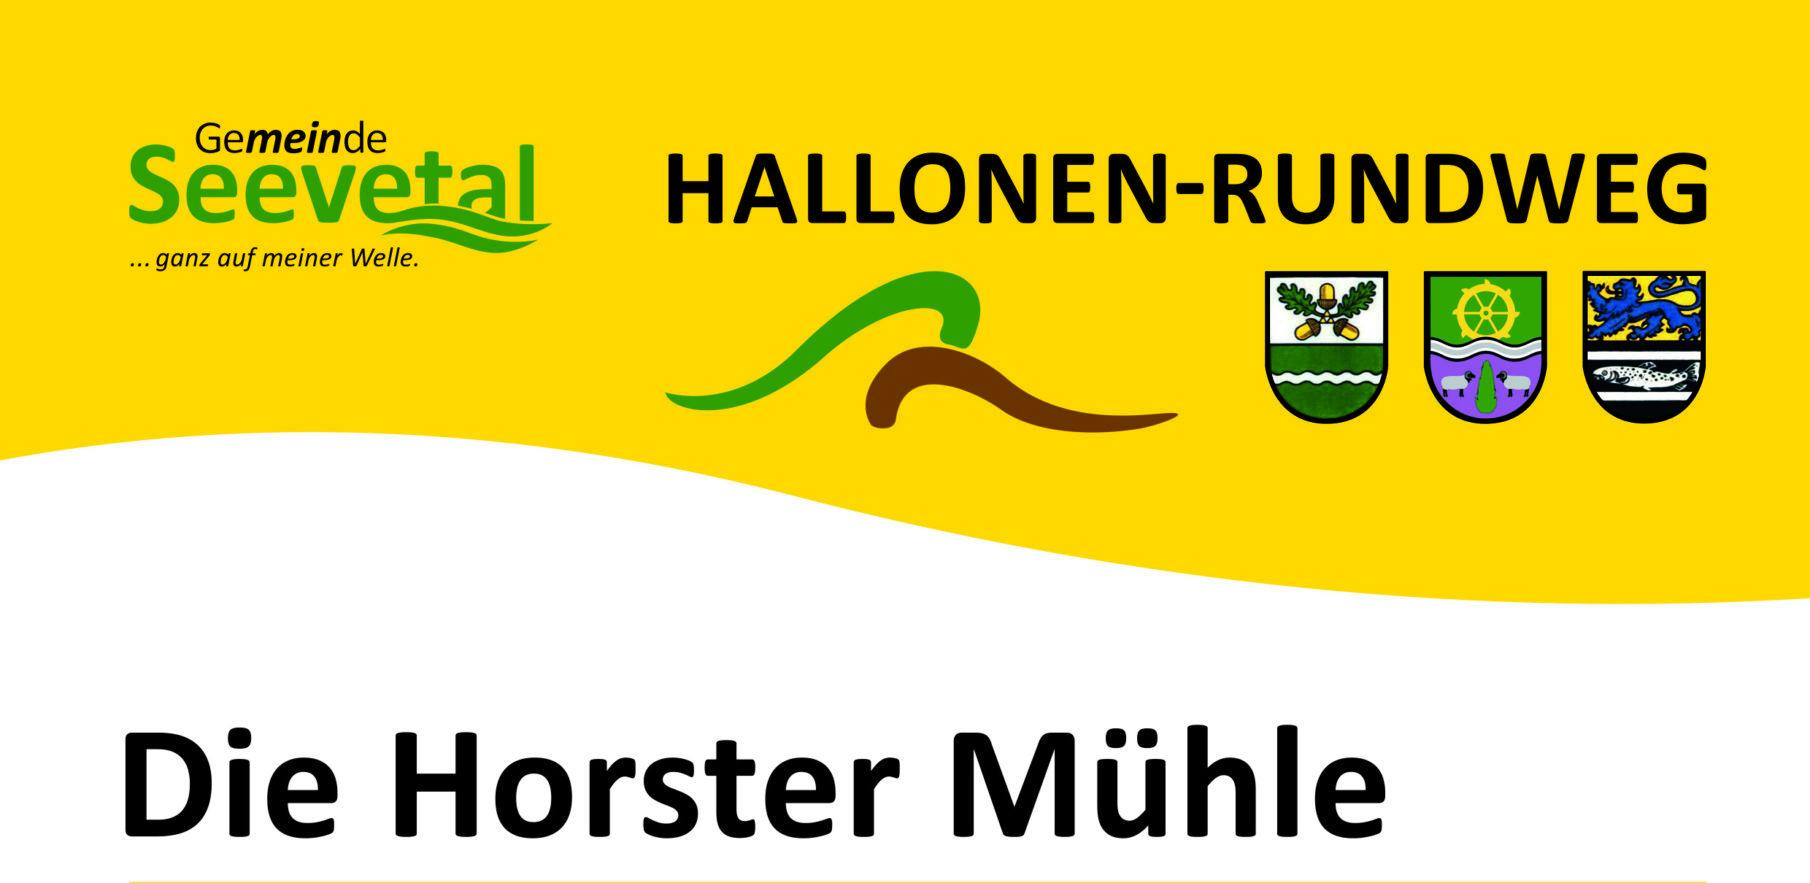 Horster Mühle